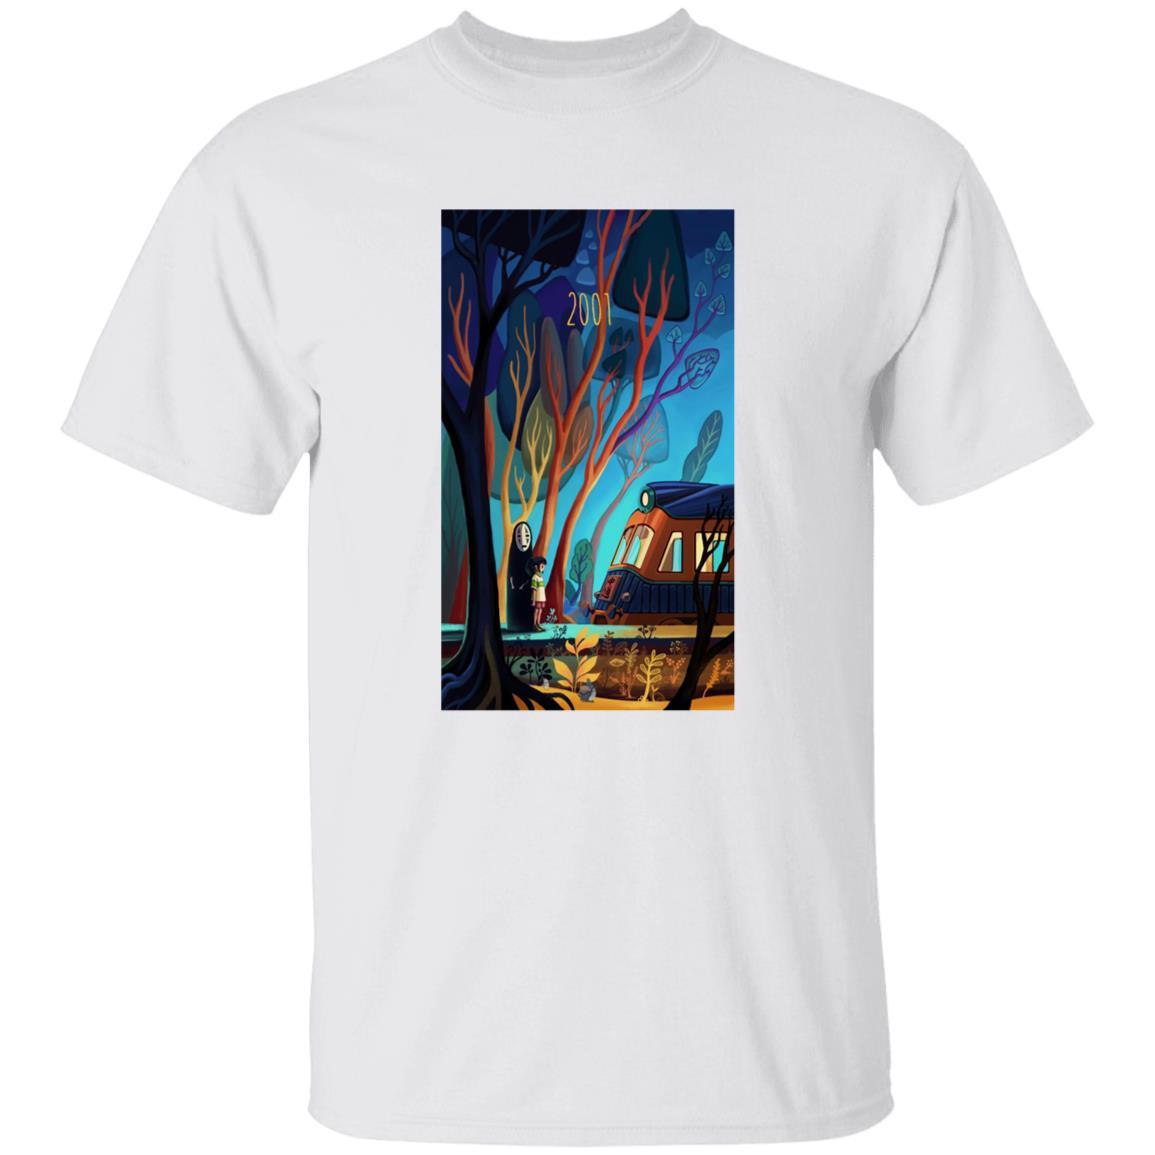 Spirited Away 2001 Illustration T Shirt